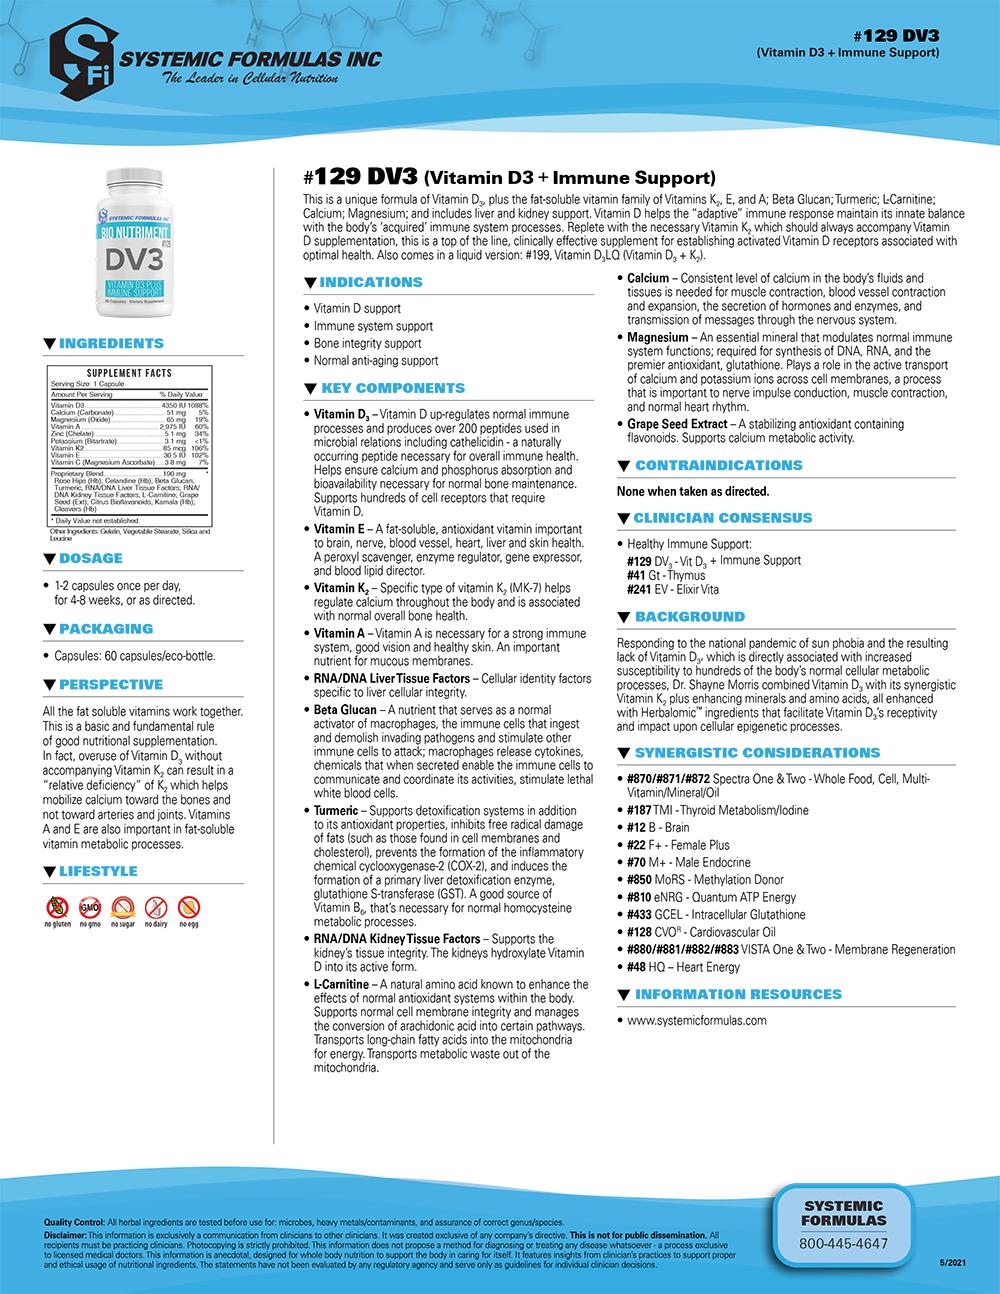 #129 DV3 (Vitamin D3 + Immune Support)